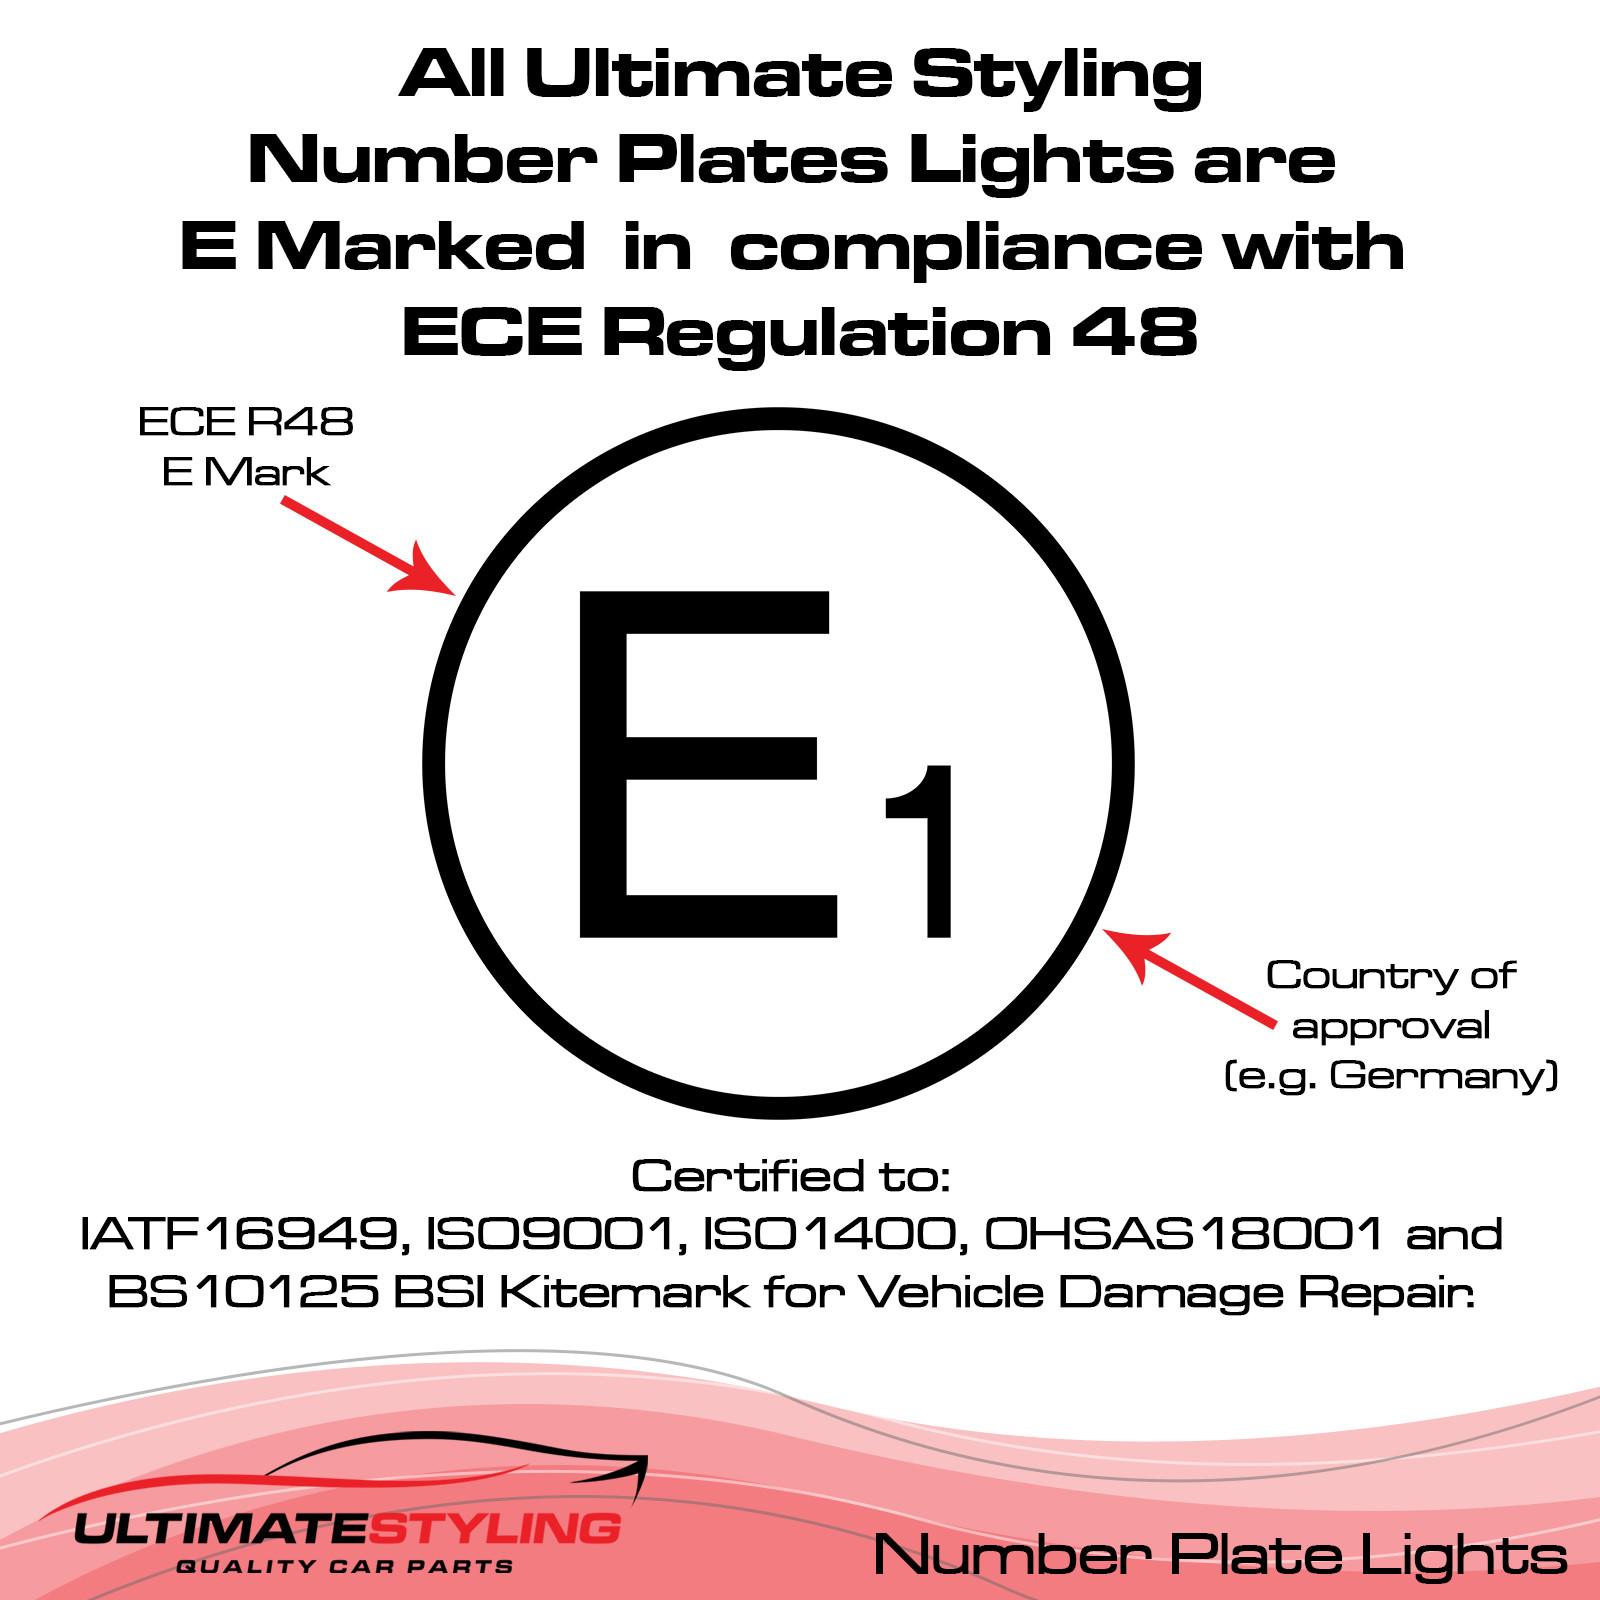 Audi A1 / A3 / A4 / A5 / A6 / A7 / Q3 / Q5 / Q7 / RS3 / RS4 / RS5 / RS6 / RS7 / RSQ3 / S1 / S3 / S4 / S5 / S6 / S7 / SQ5 / SQ7 / TT Rear Number Plate Light - Universal (LH or RH)